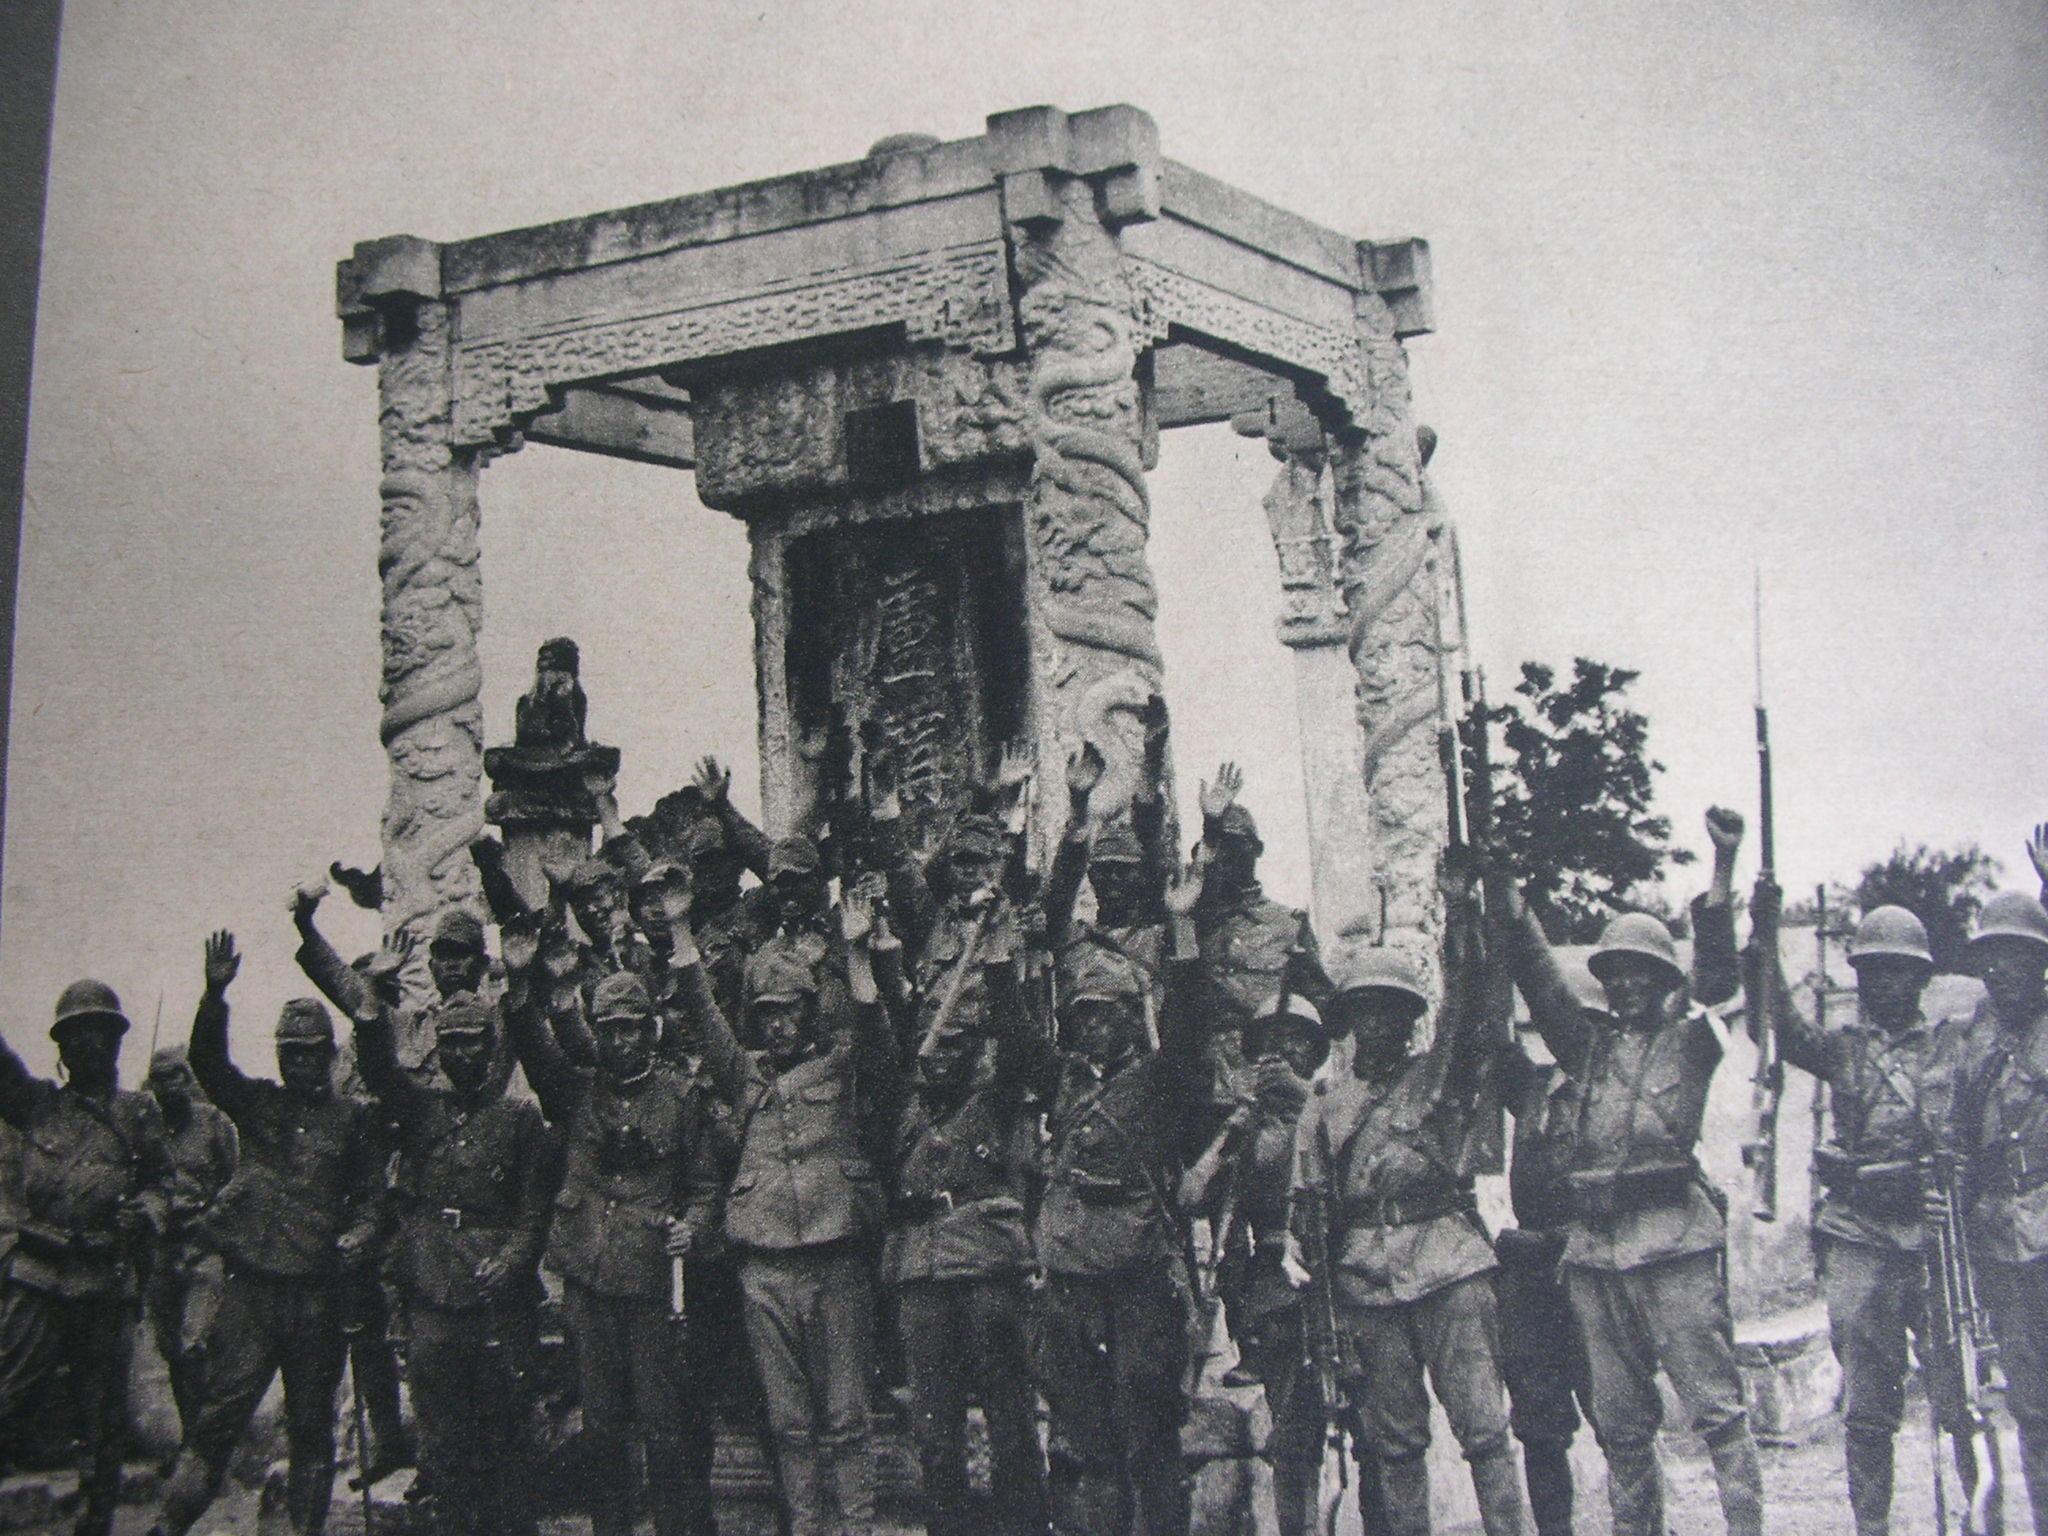 Japanese troops celebrate victory at the Lugou Bridge in 1937 (World War II Database)